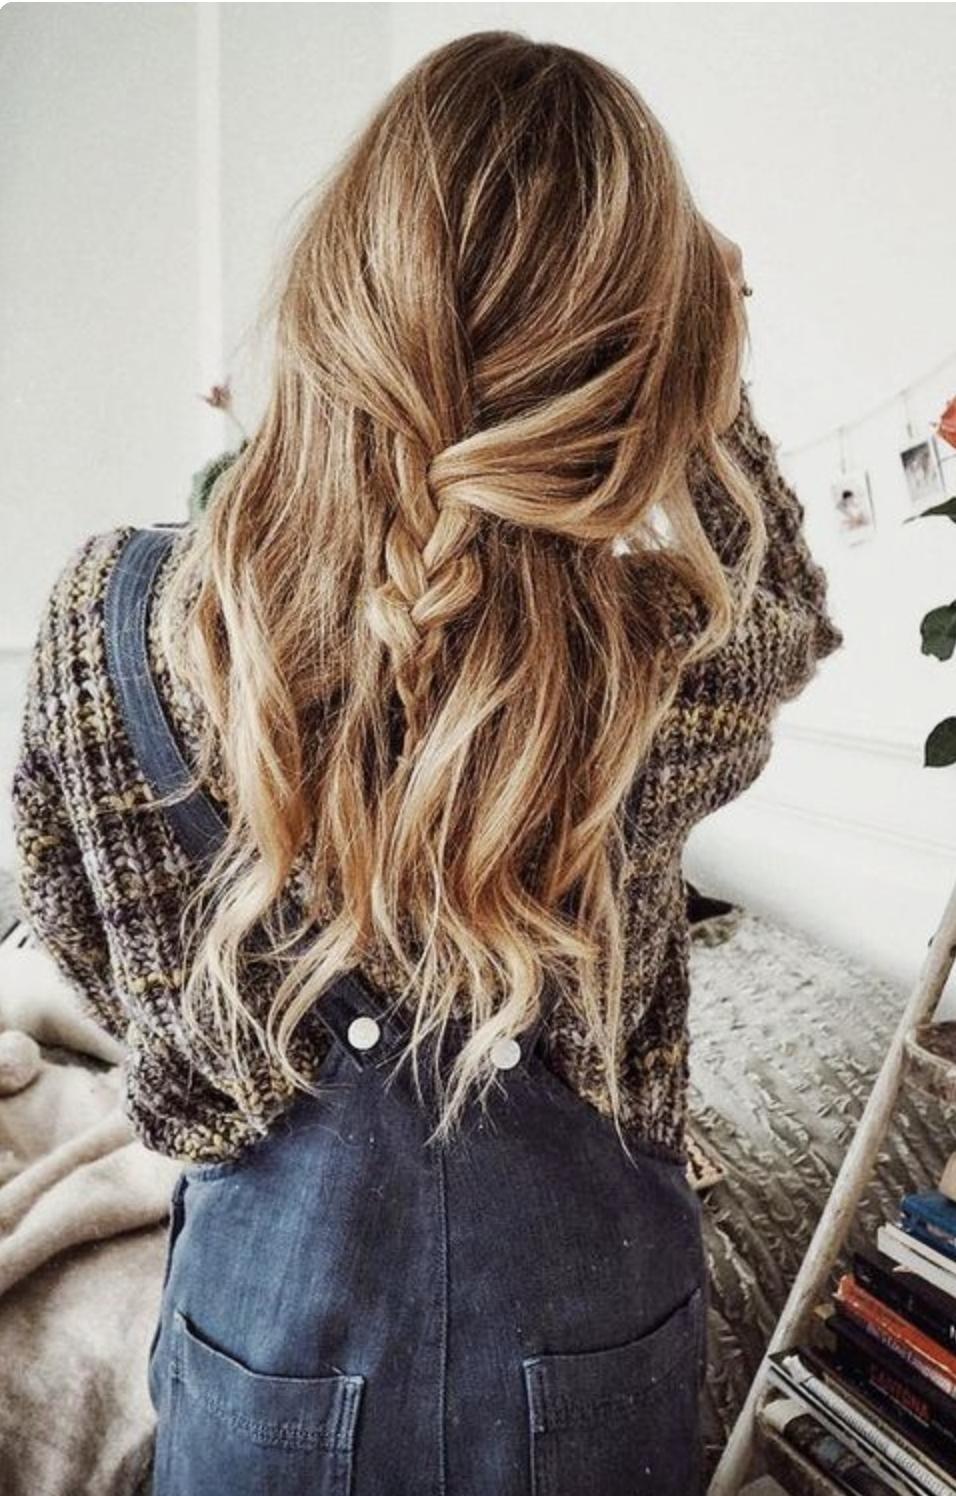 x (long braided half up)